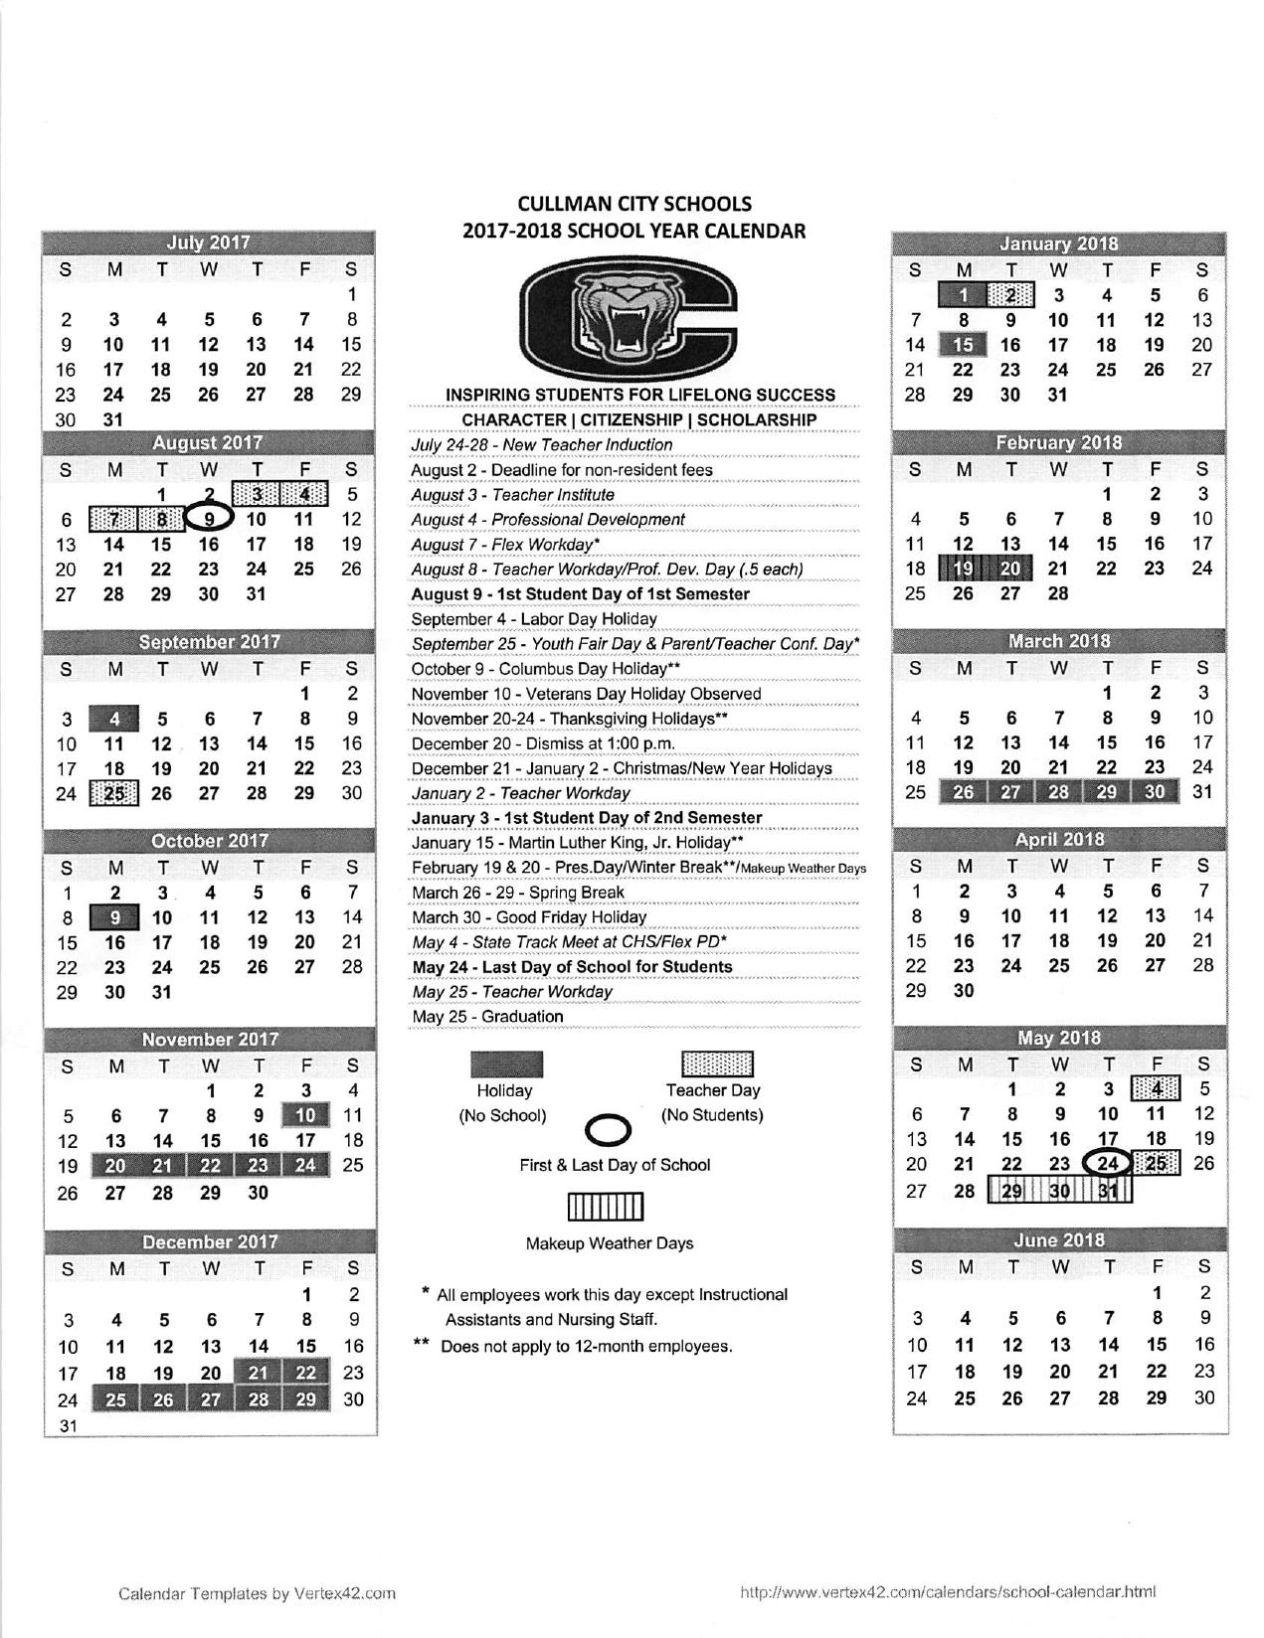 SCHOOL DAYS: 2017-2018 Calendars for Cullman County, City